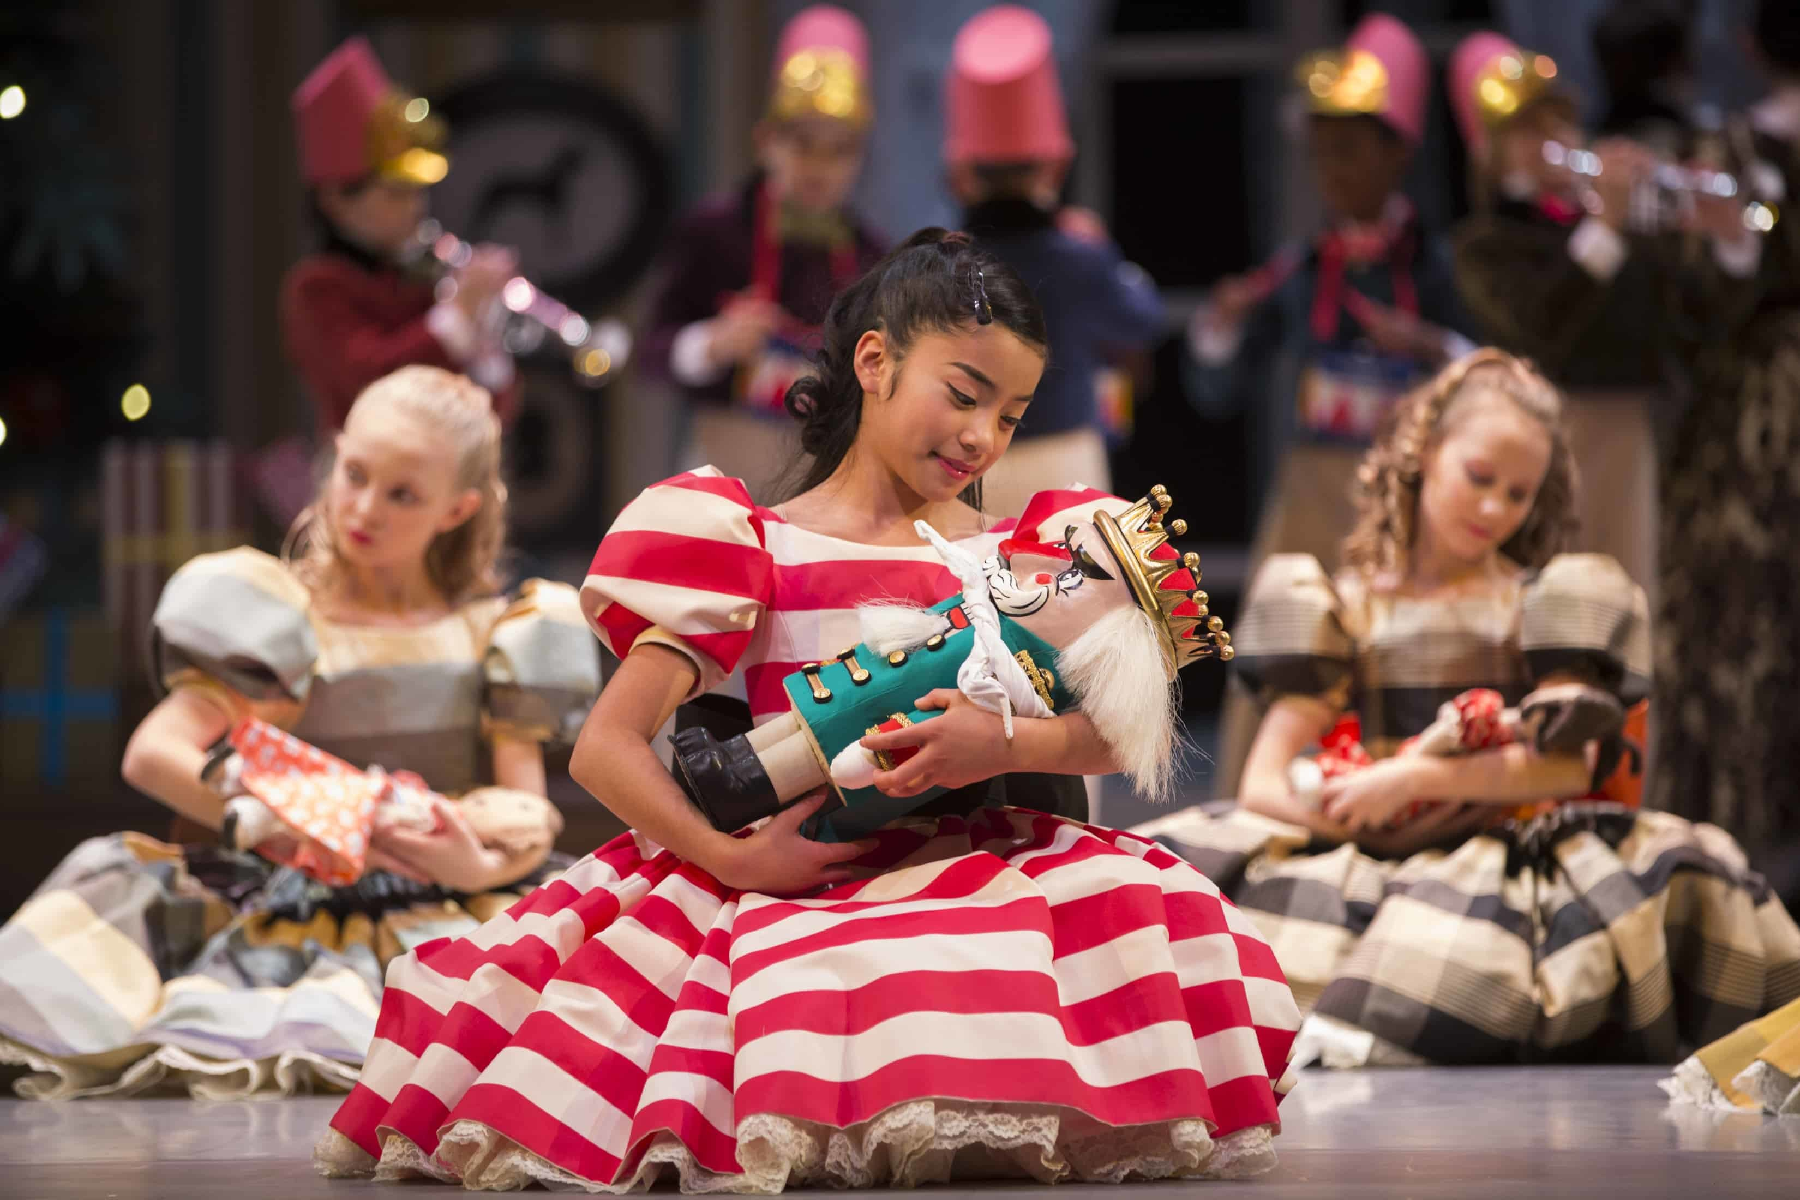 Clara with her Nutcracker doll. George Balanchine's The Nutcracker®, choreography by George Balanchine © The George Balanchine Trust. Photo © Angela Sterling.